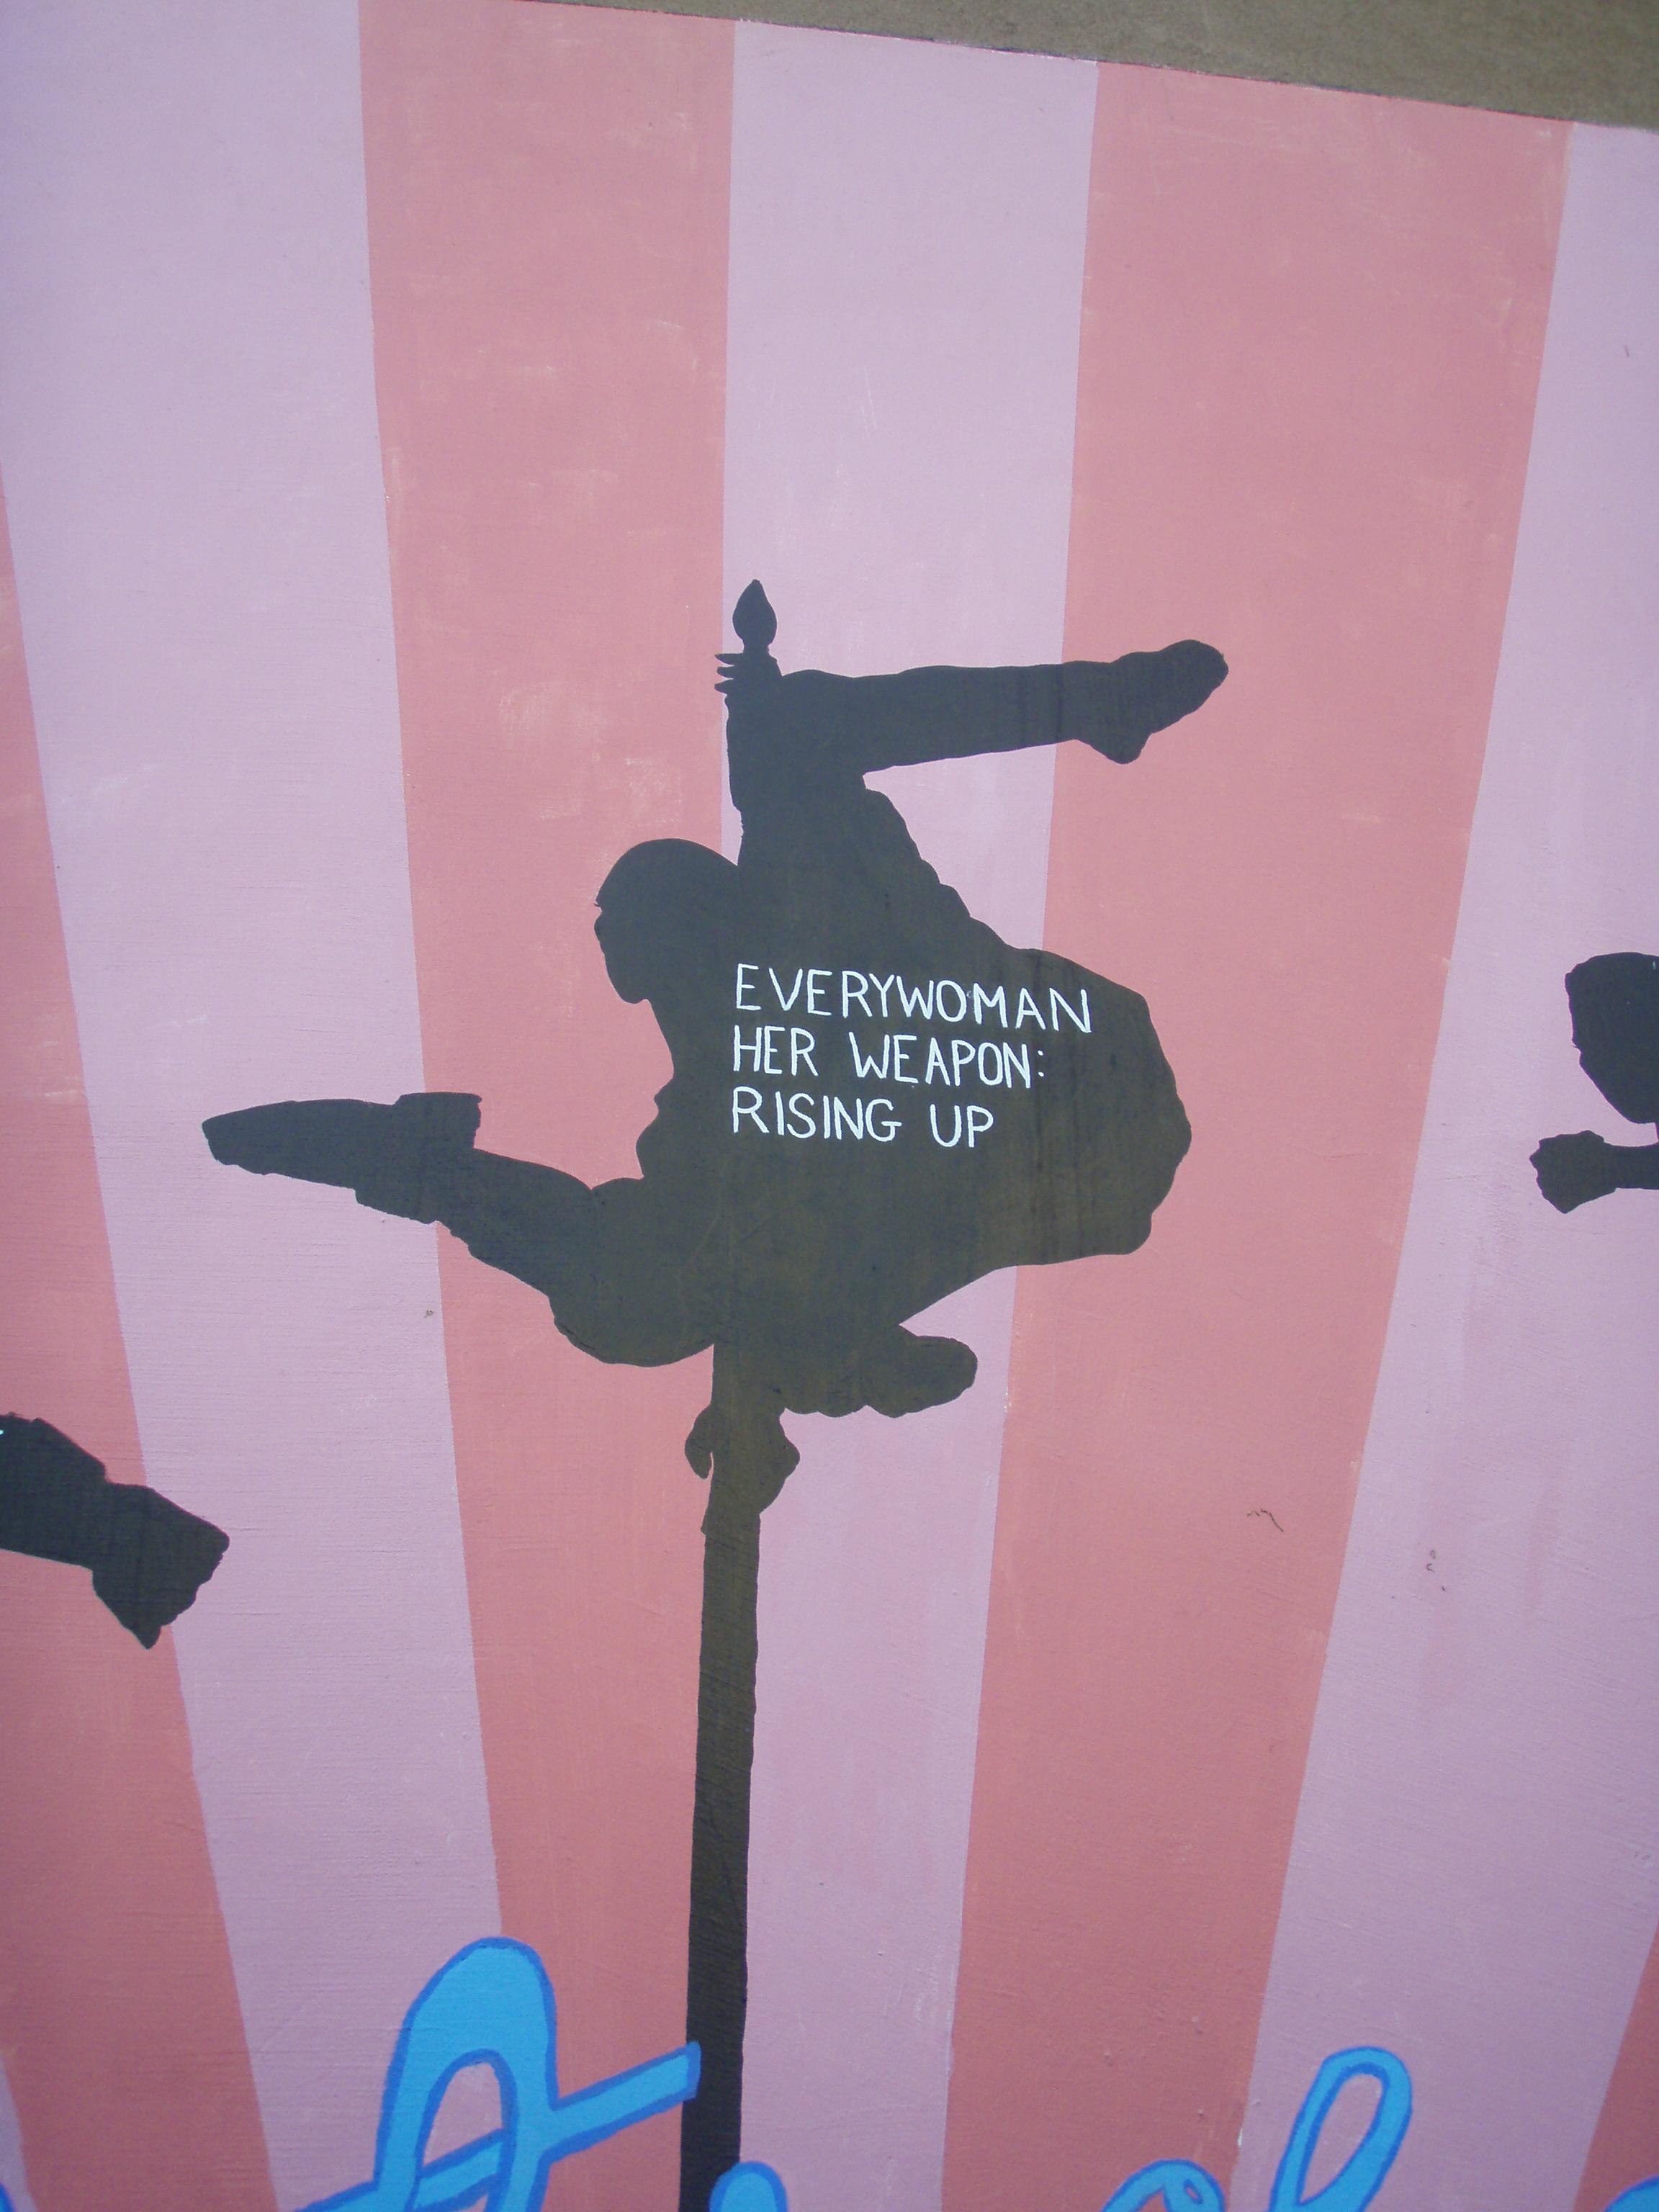 Thus endeth the Mural Photoessay